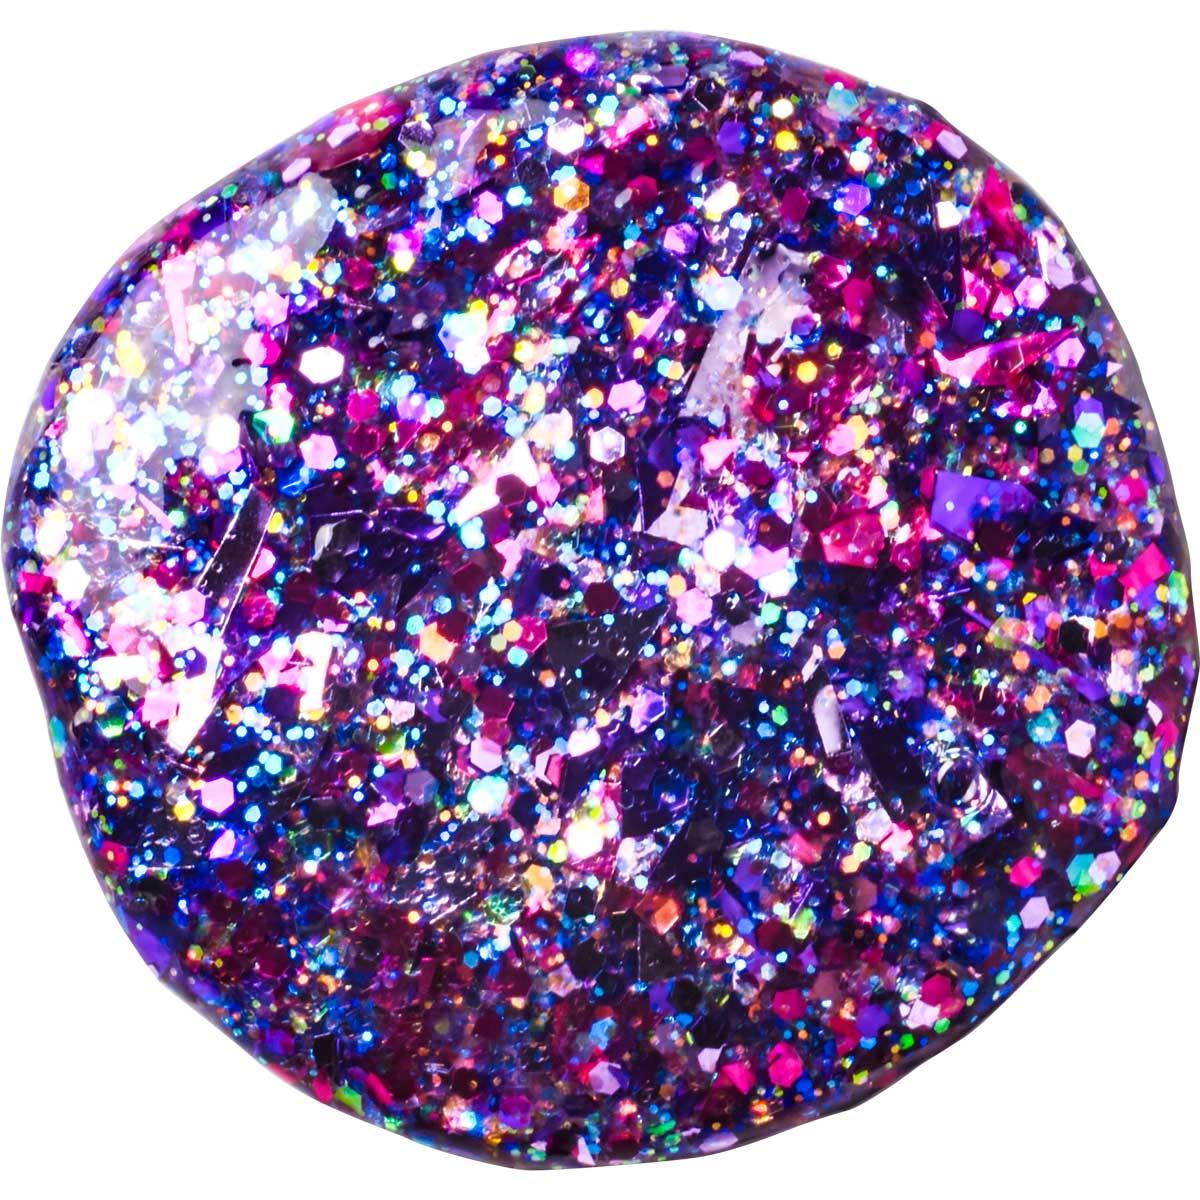 FolkArt ® Glitterific™ Acrylic Paint - Princess, 2 oz.